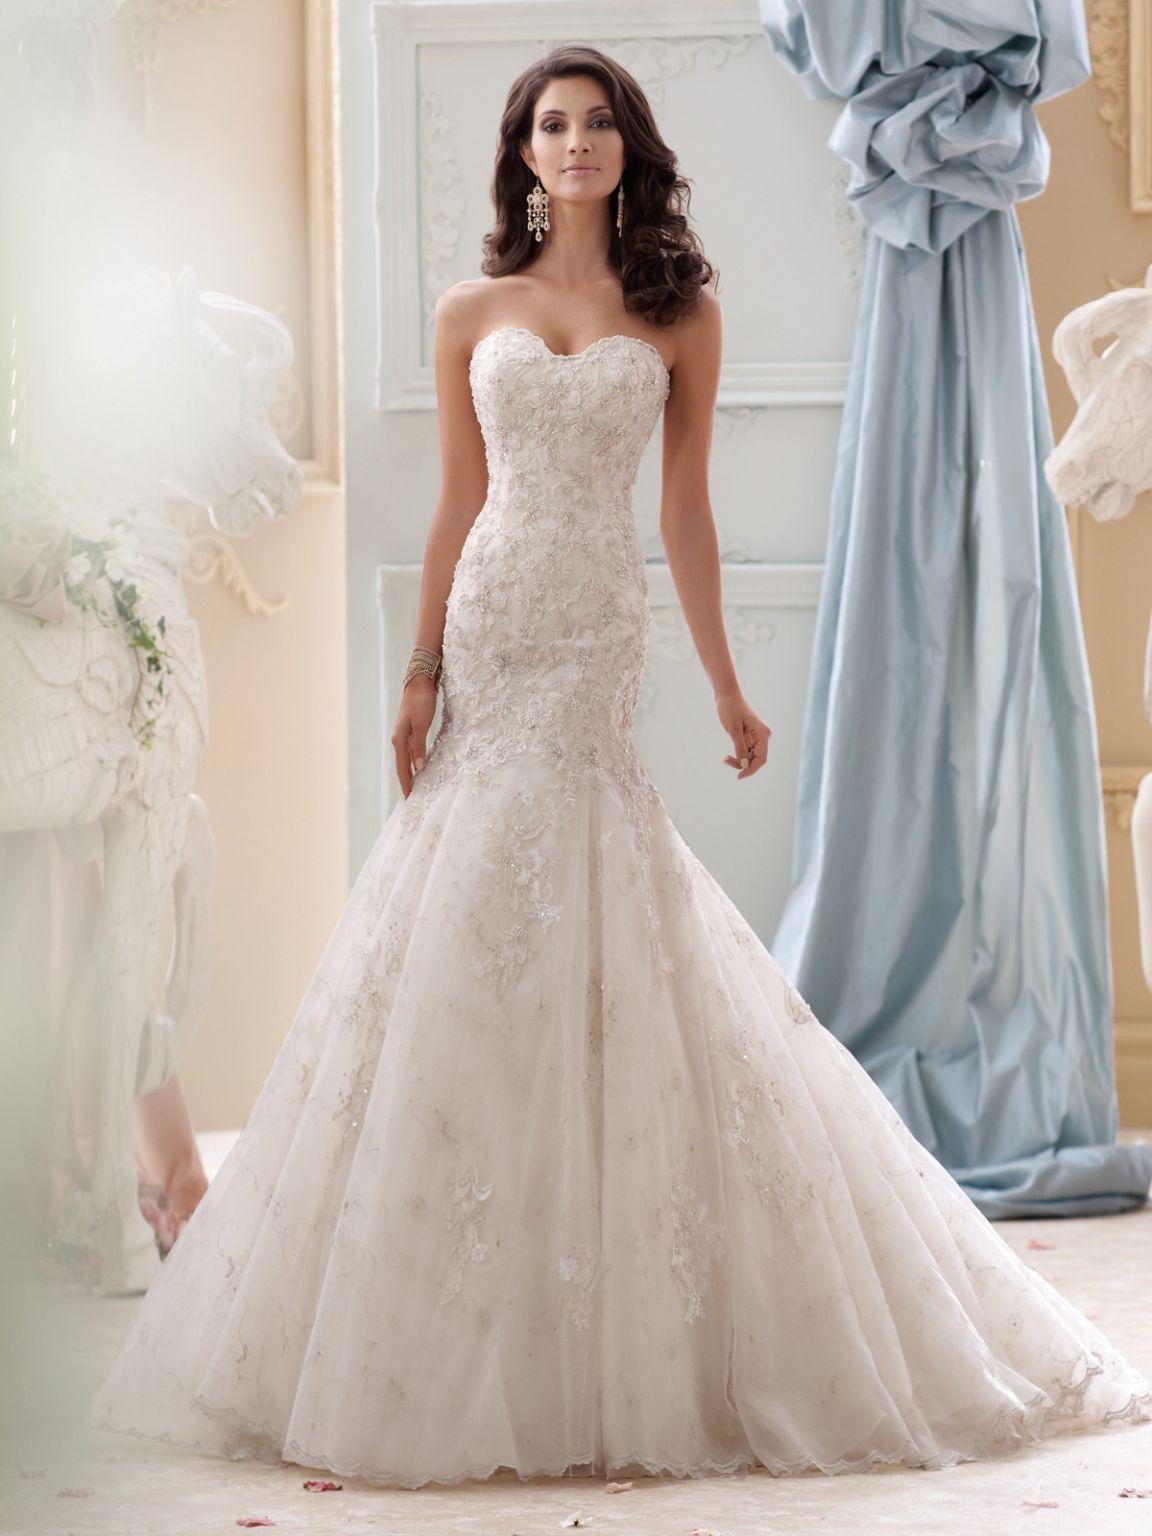 2017 David Tutera For Mon Cheri Wedding Dresses David Tutera Wedding Dresses Wedding Dresses Fit And Flare Wedding Dress